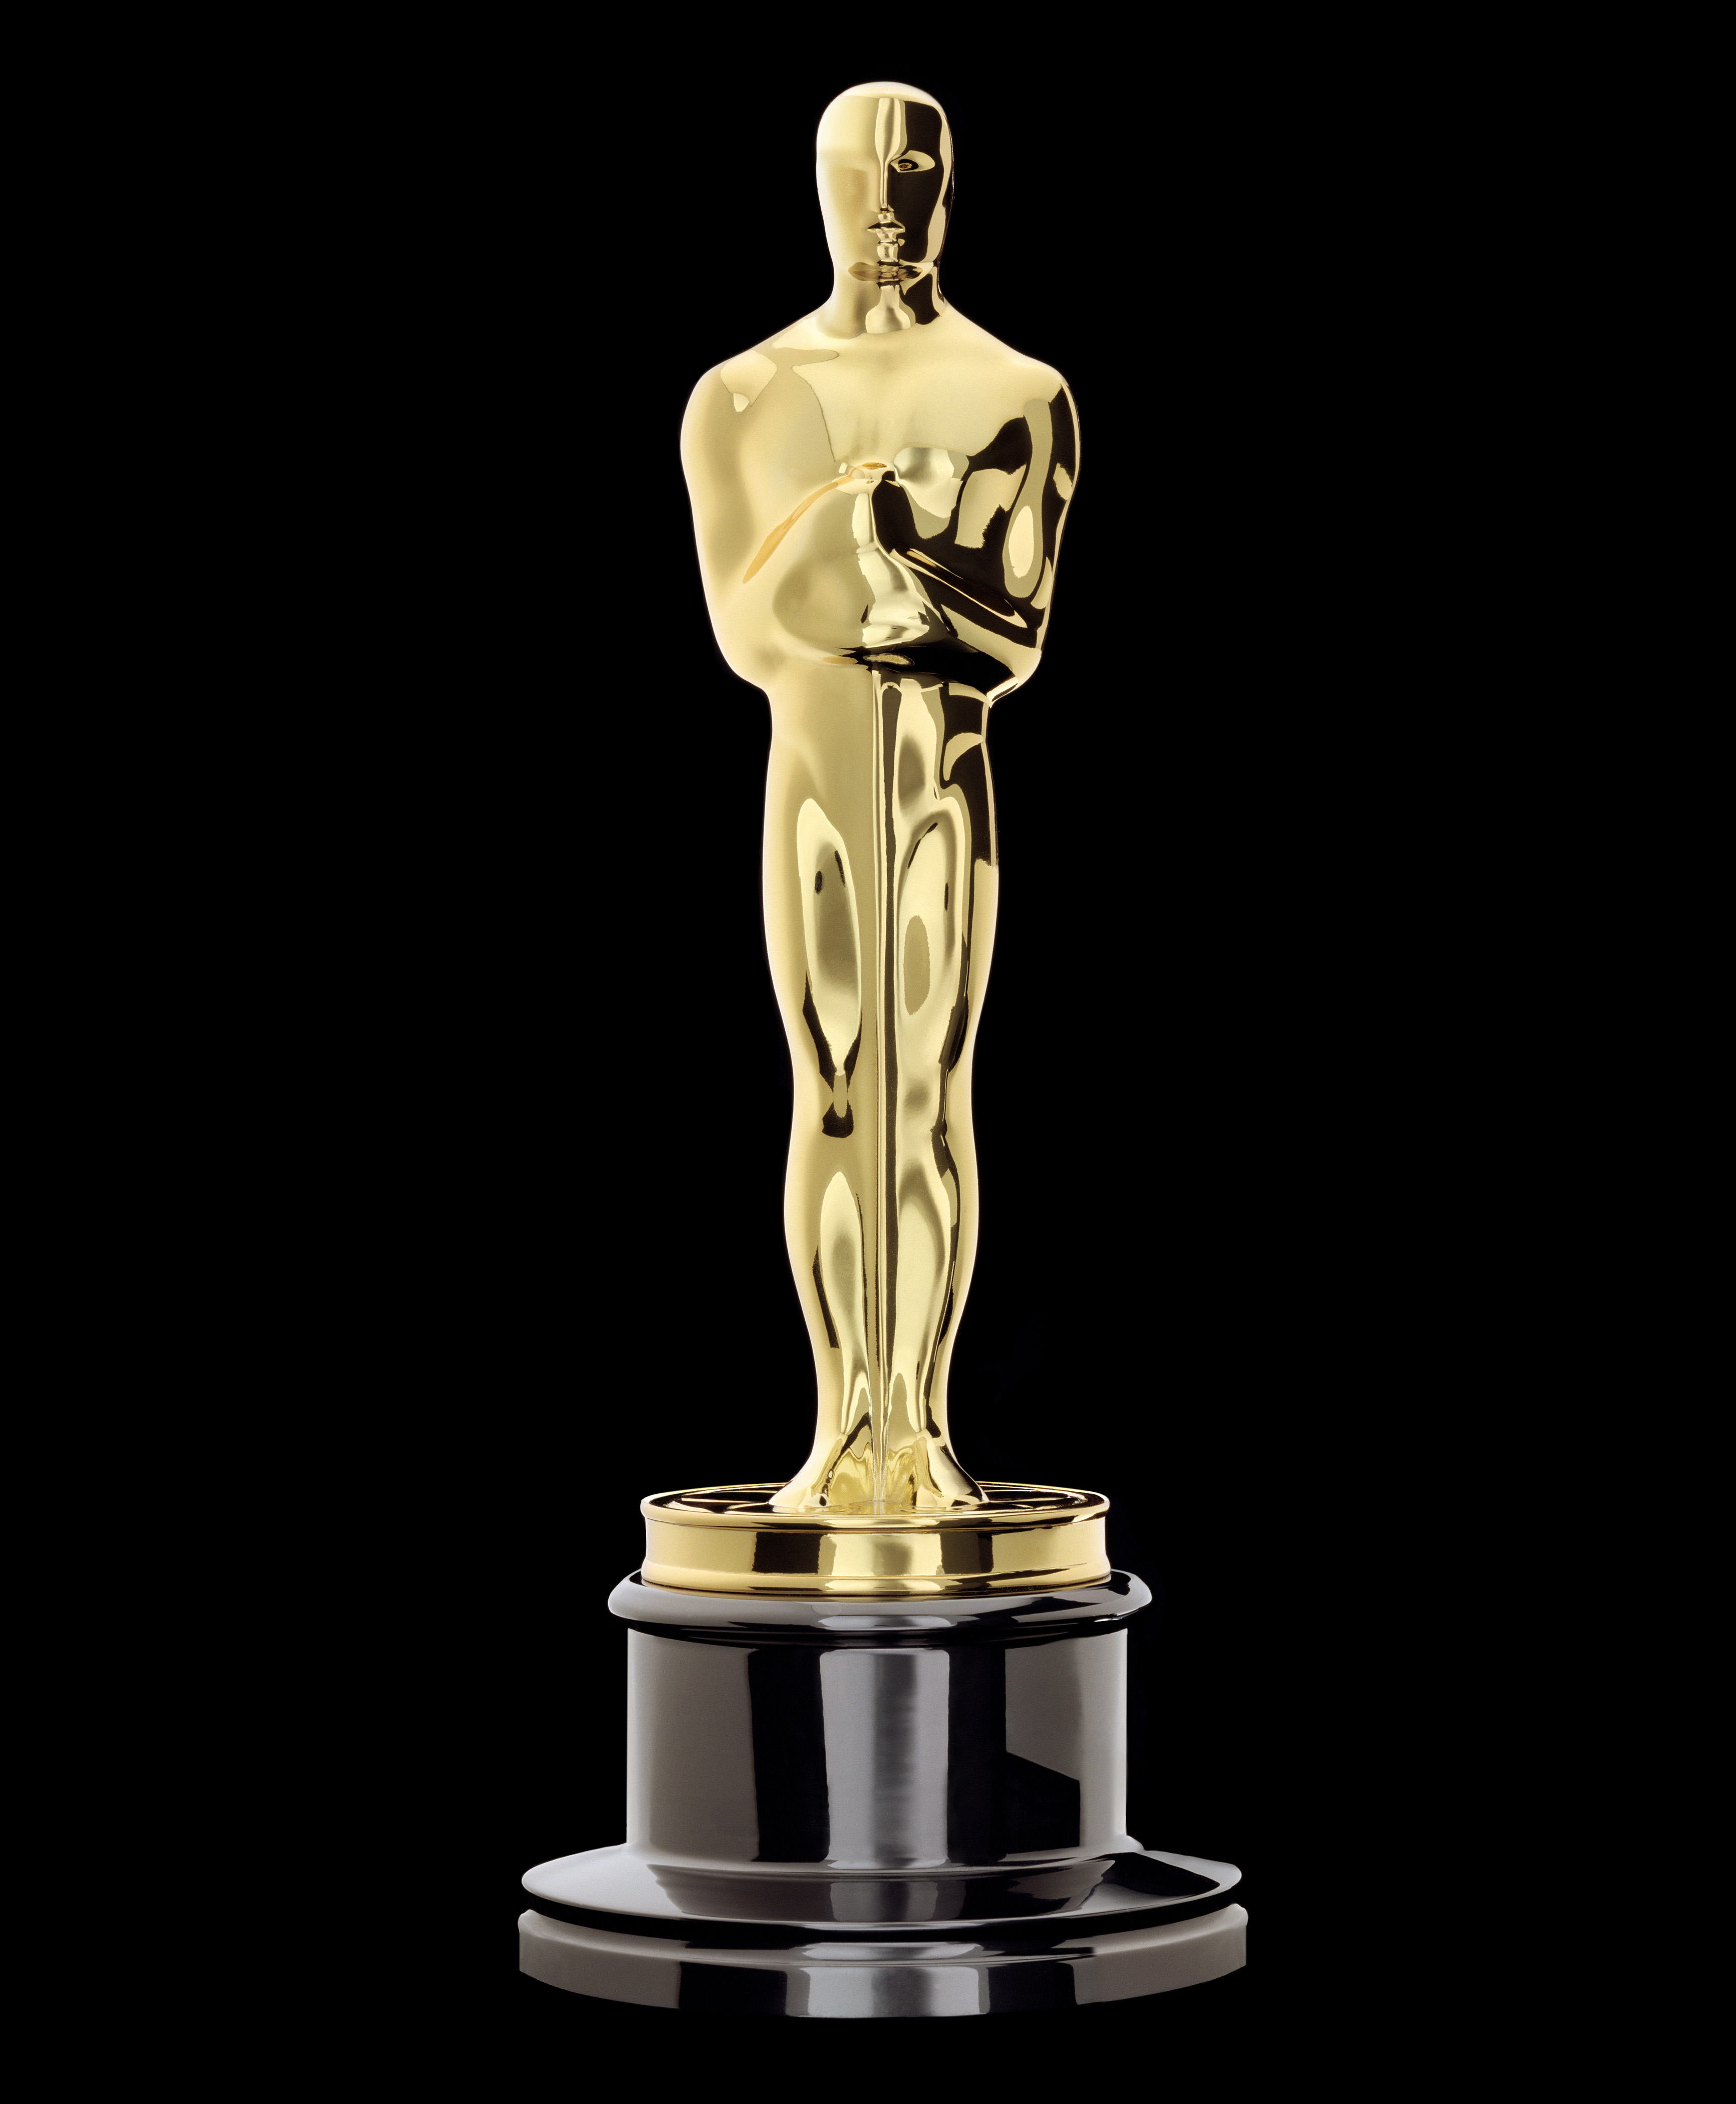 Oscar Award Trophy PNG - 72819